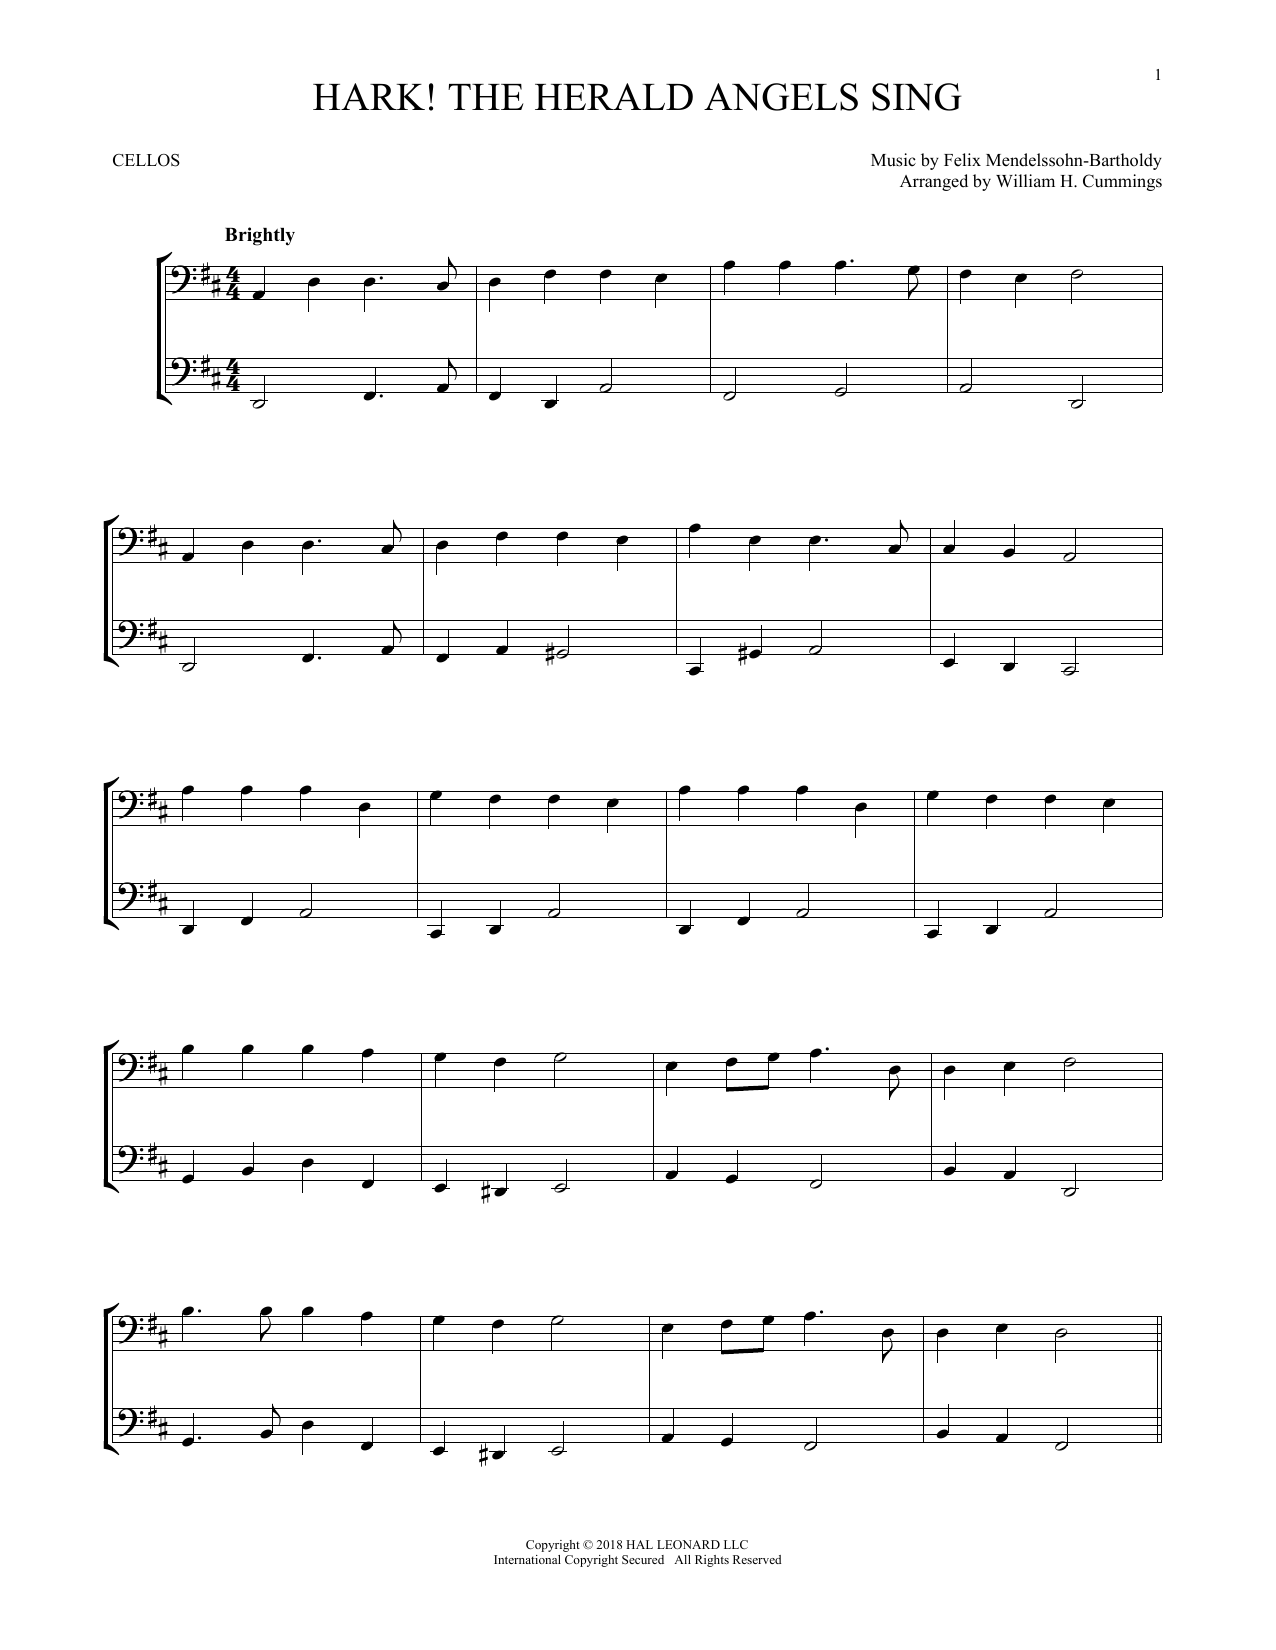 Felix Mendelssohn Bartholdy Hark The Herald Angels Sing Sheet Music Notes Chords Download Printable Vcldt Sku 255175